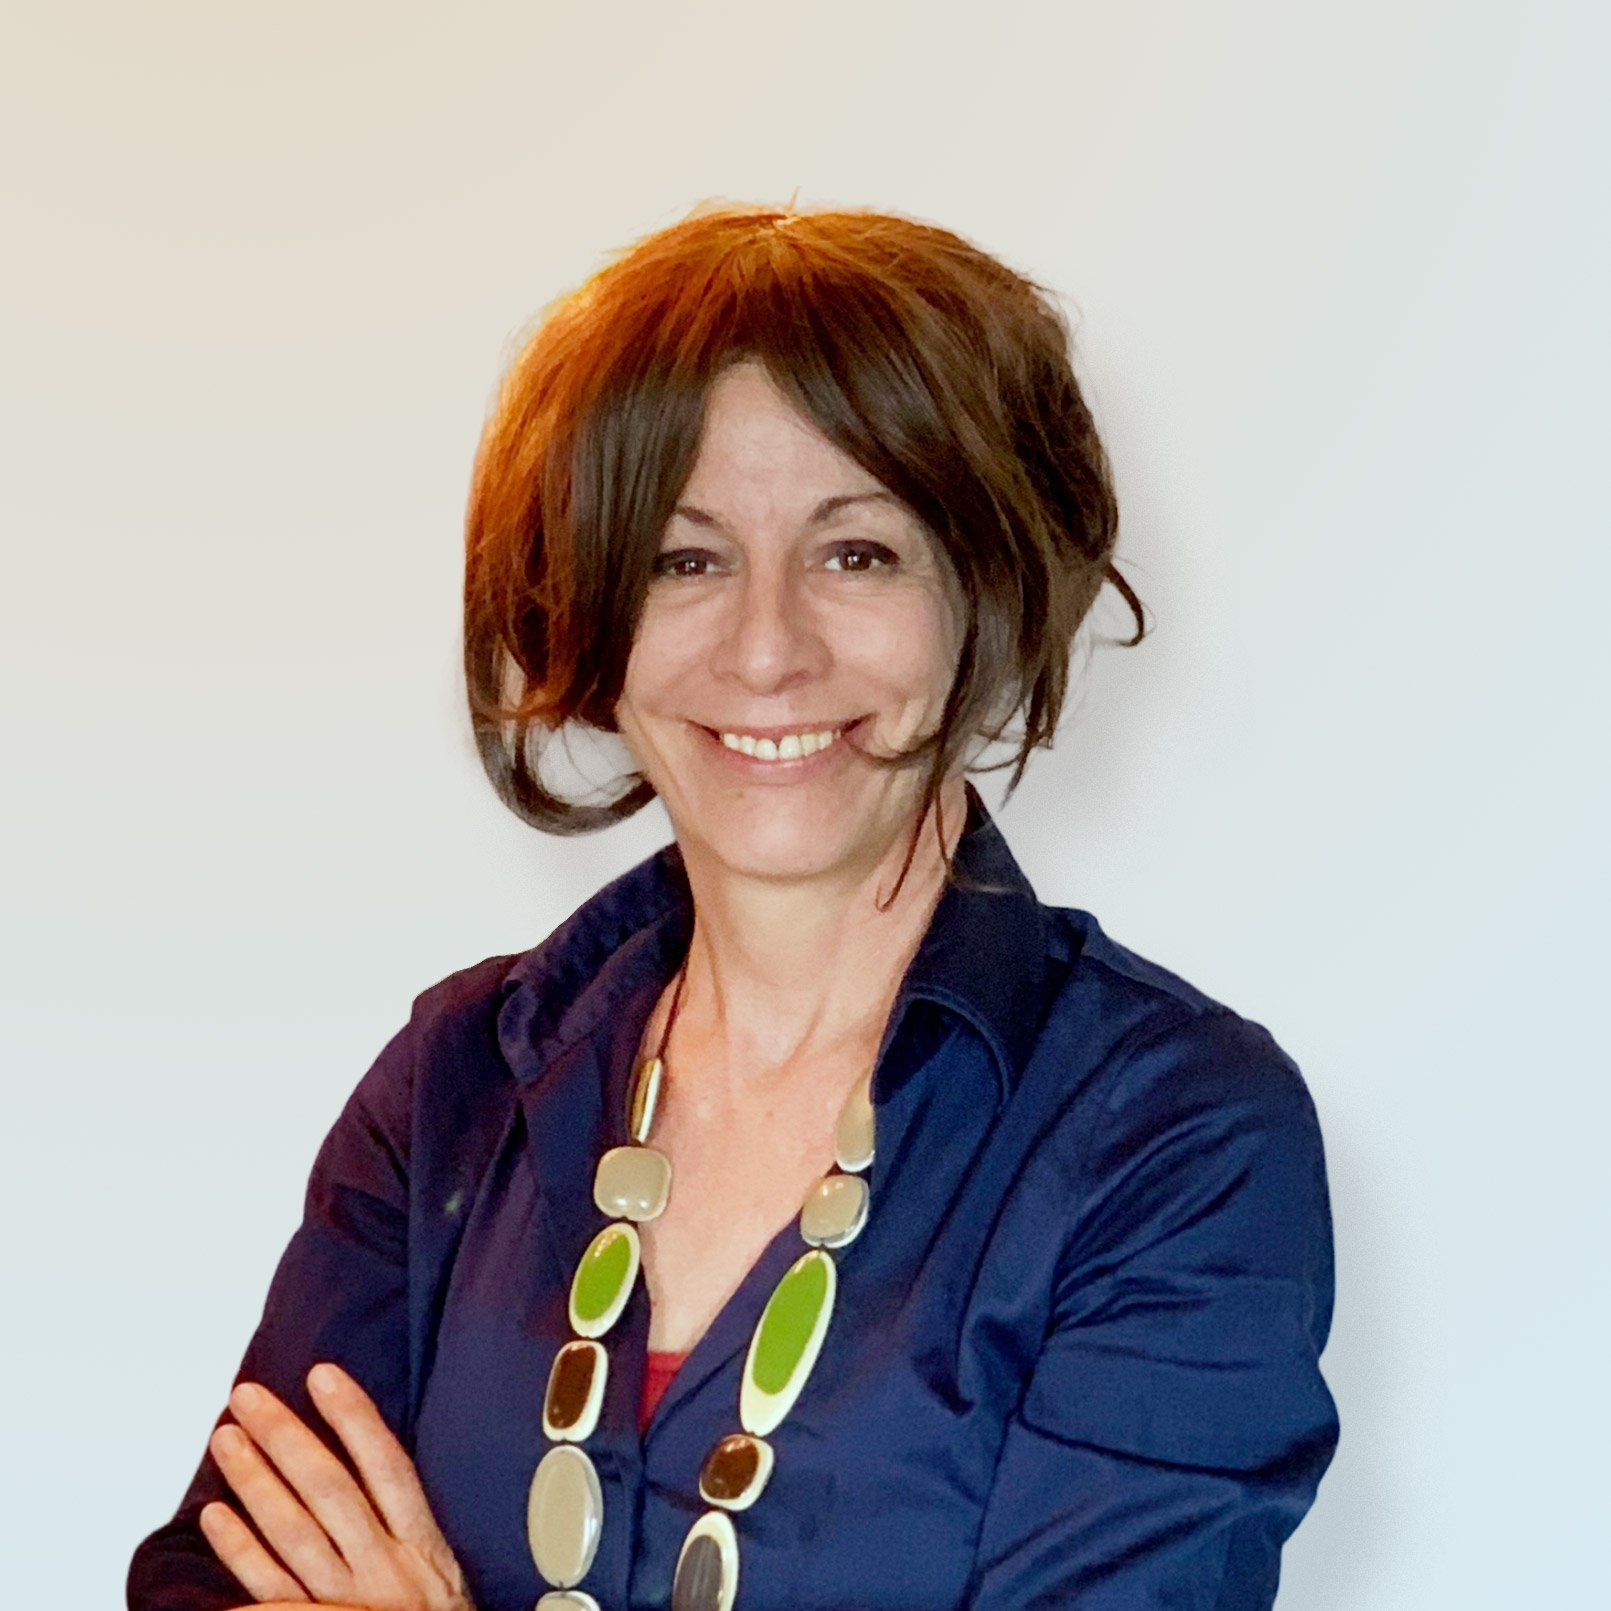 Silvia Calvi